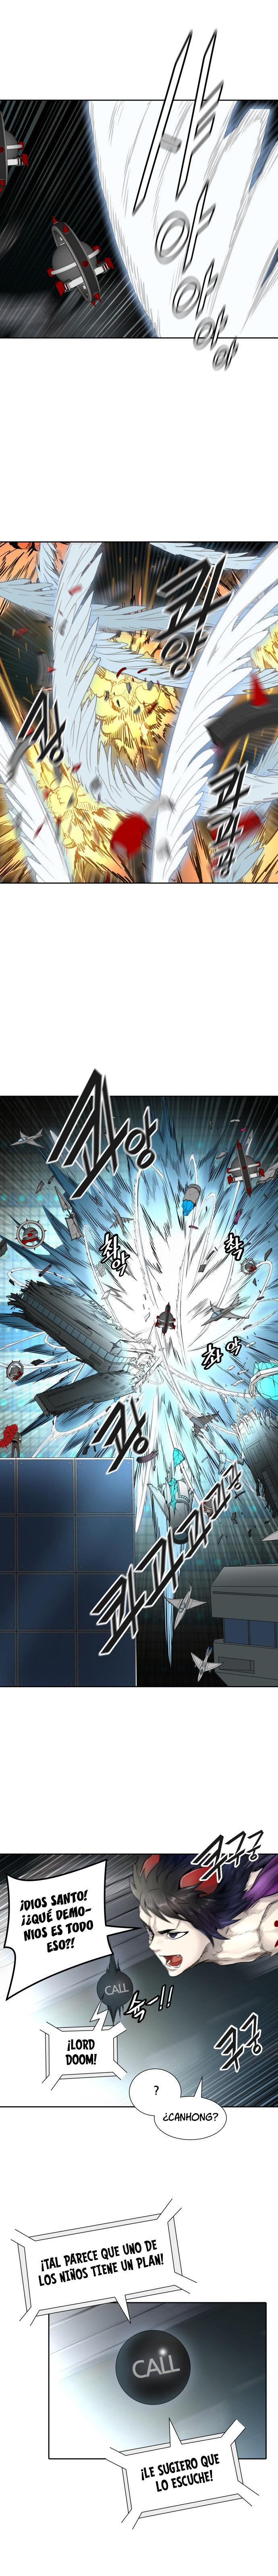 https://nine.mangadogs.com/es_manga/pic8/21/149/946147/90c0f9bdcc0baee52fc7928a6548af9b.jpg Page 3